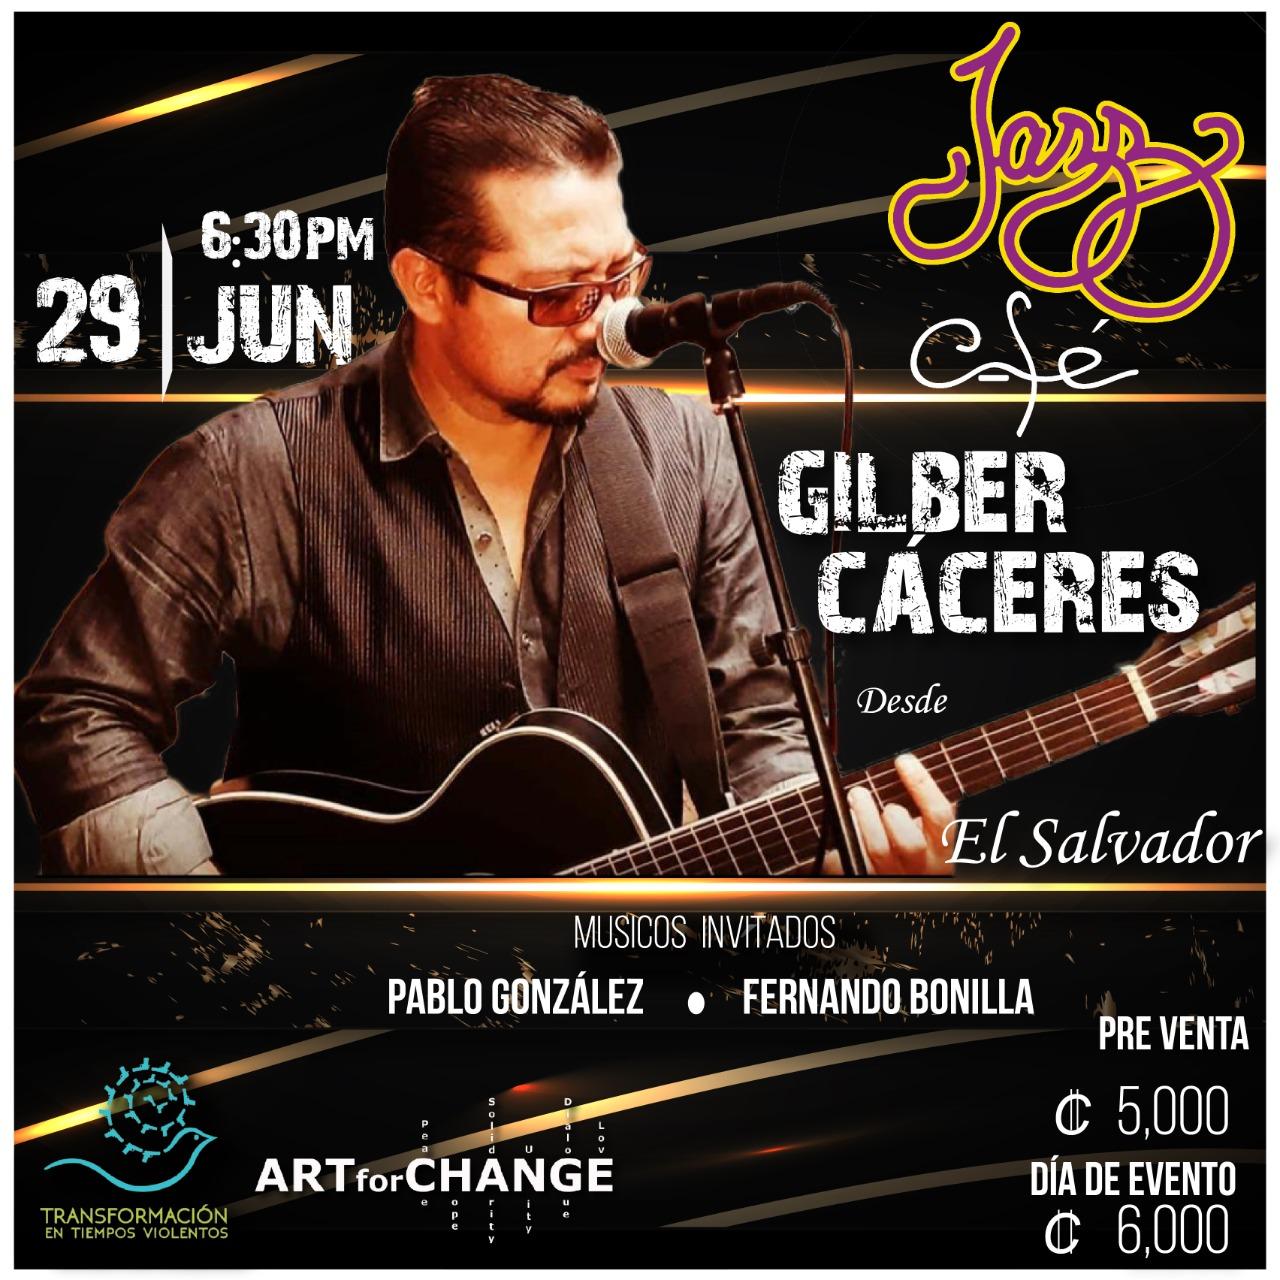 Gilber Cáceres